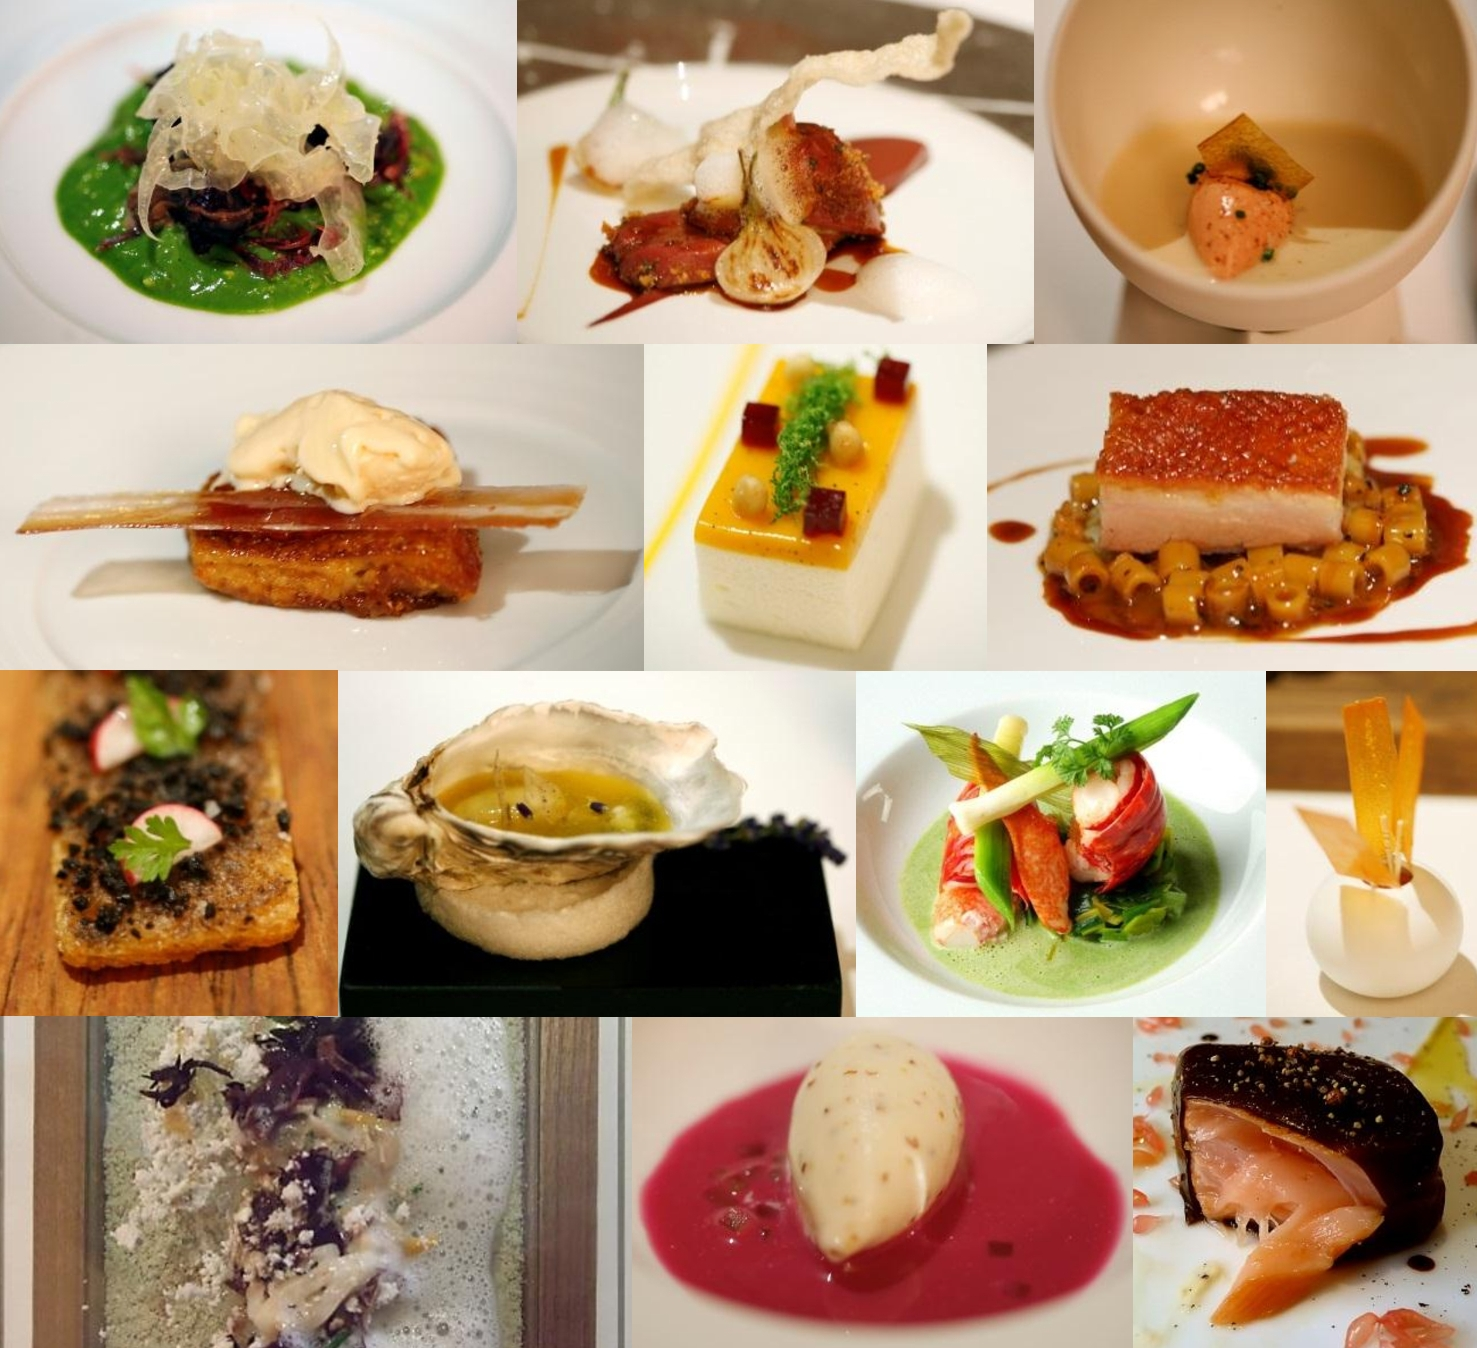 KGB: Kerry's Gourmet Burgers